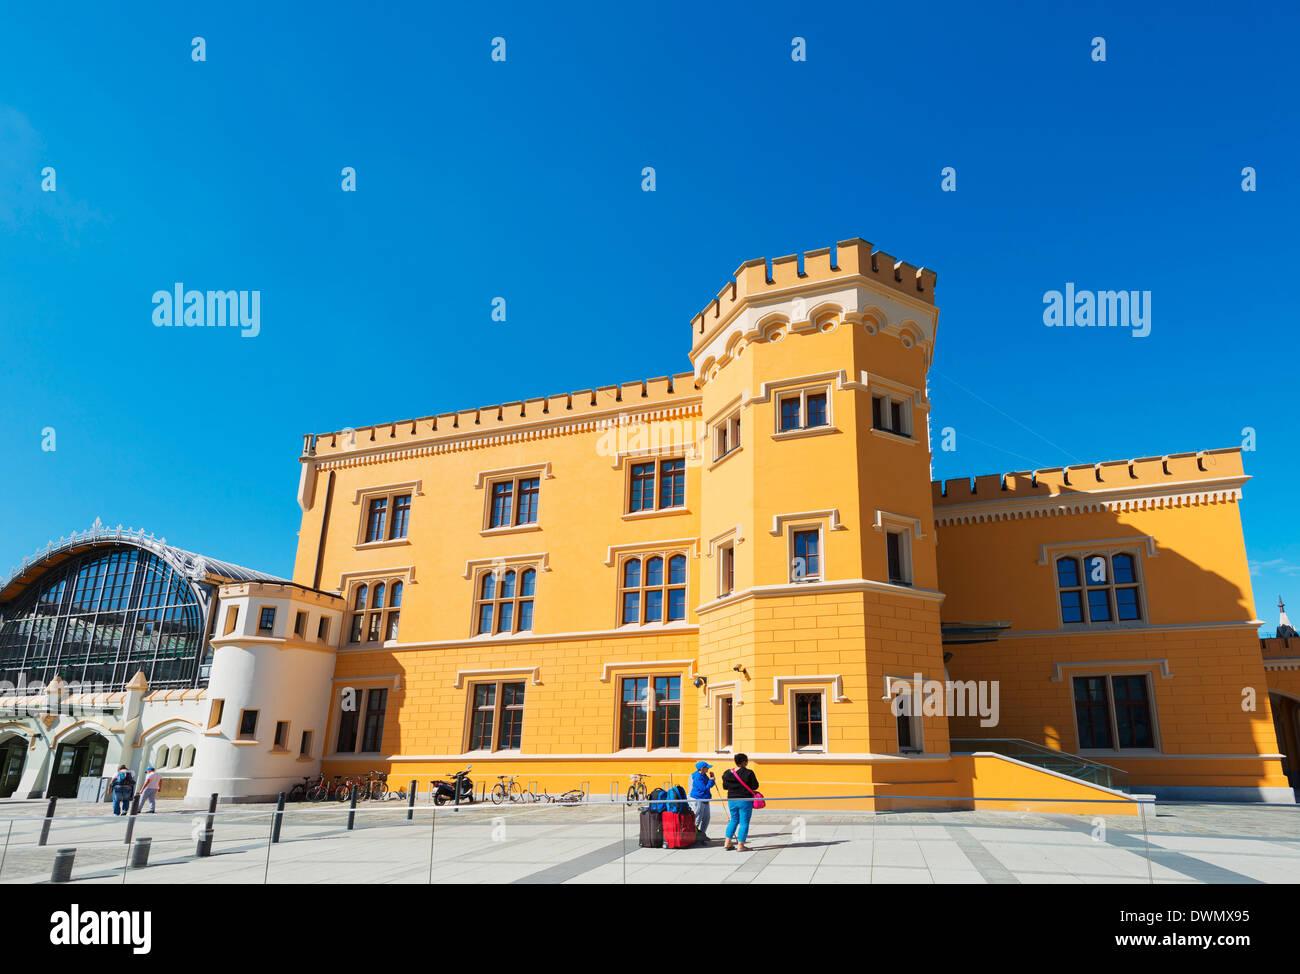 Railway station building, Wroclaw, Silesia, Poland, Europe - Stock Image